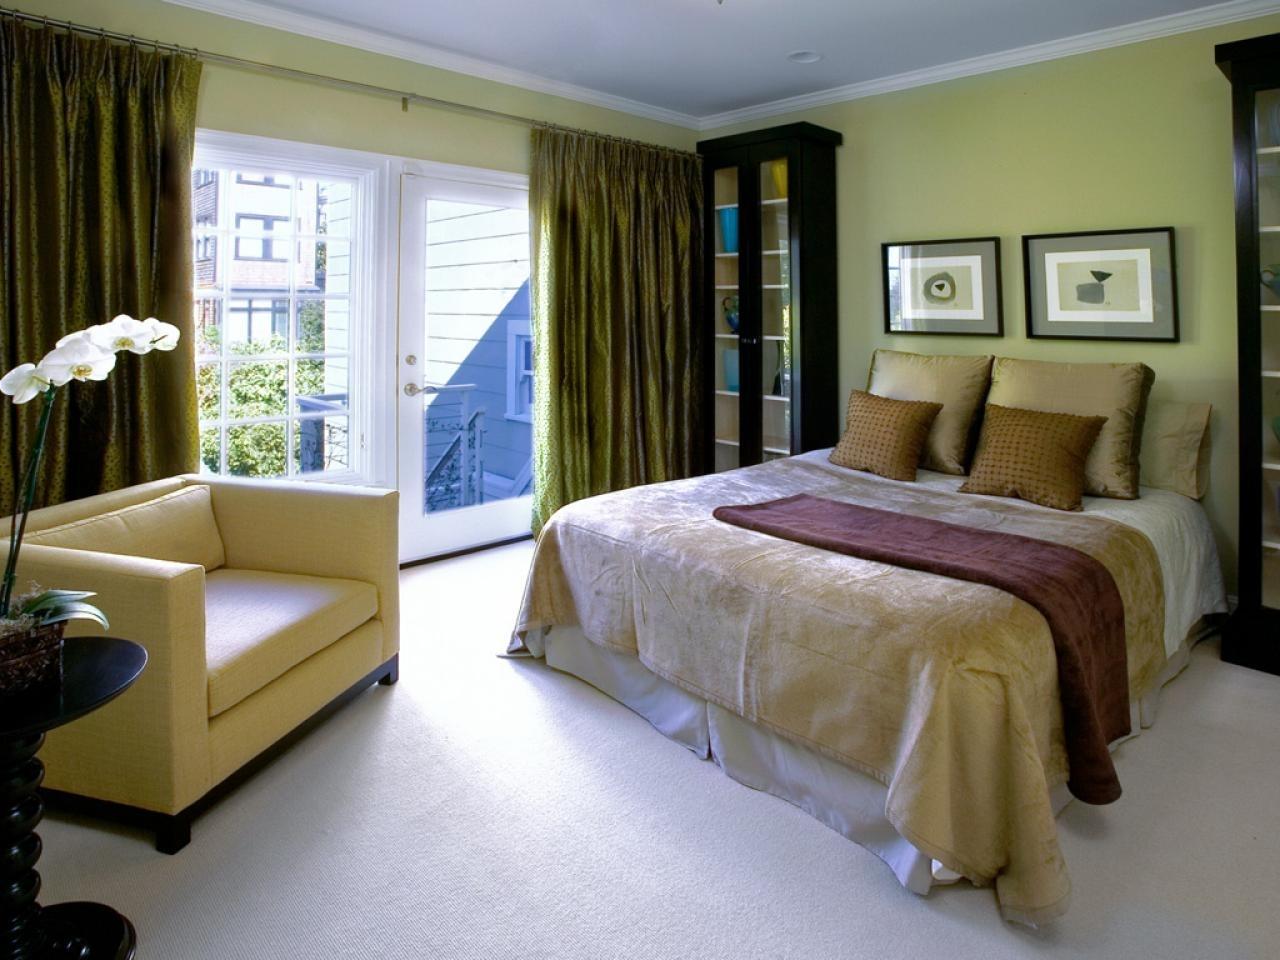 bedroom paint color ideas: pictures & options | hgtv